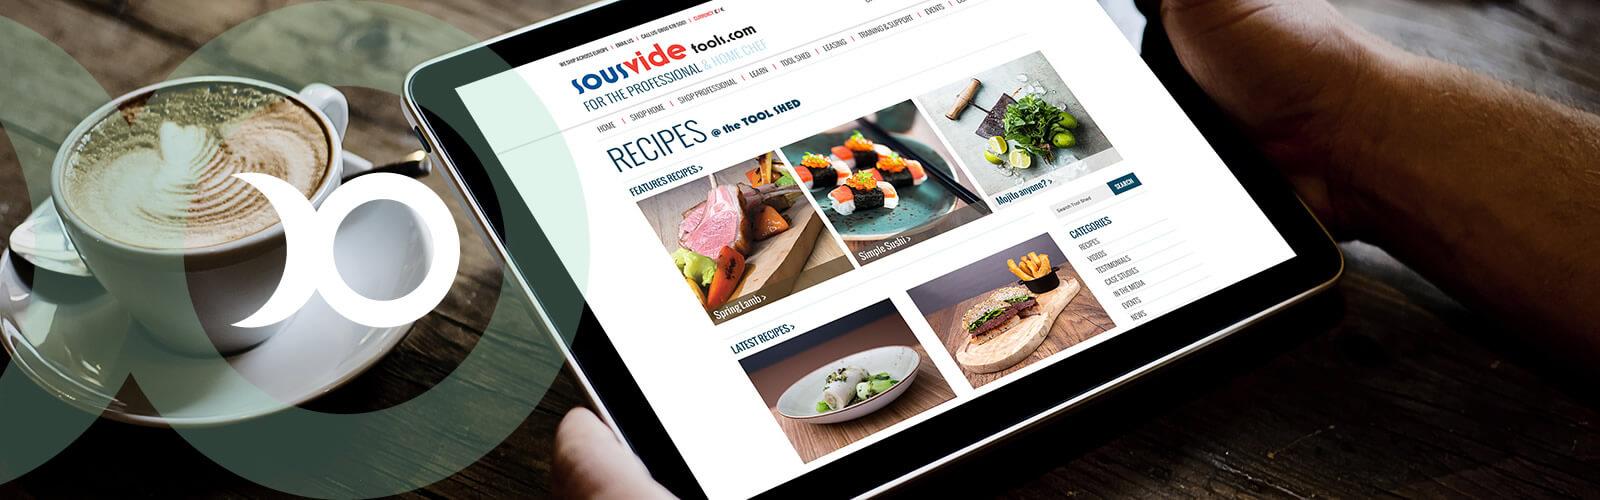 blog design services